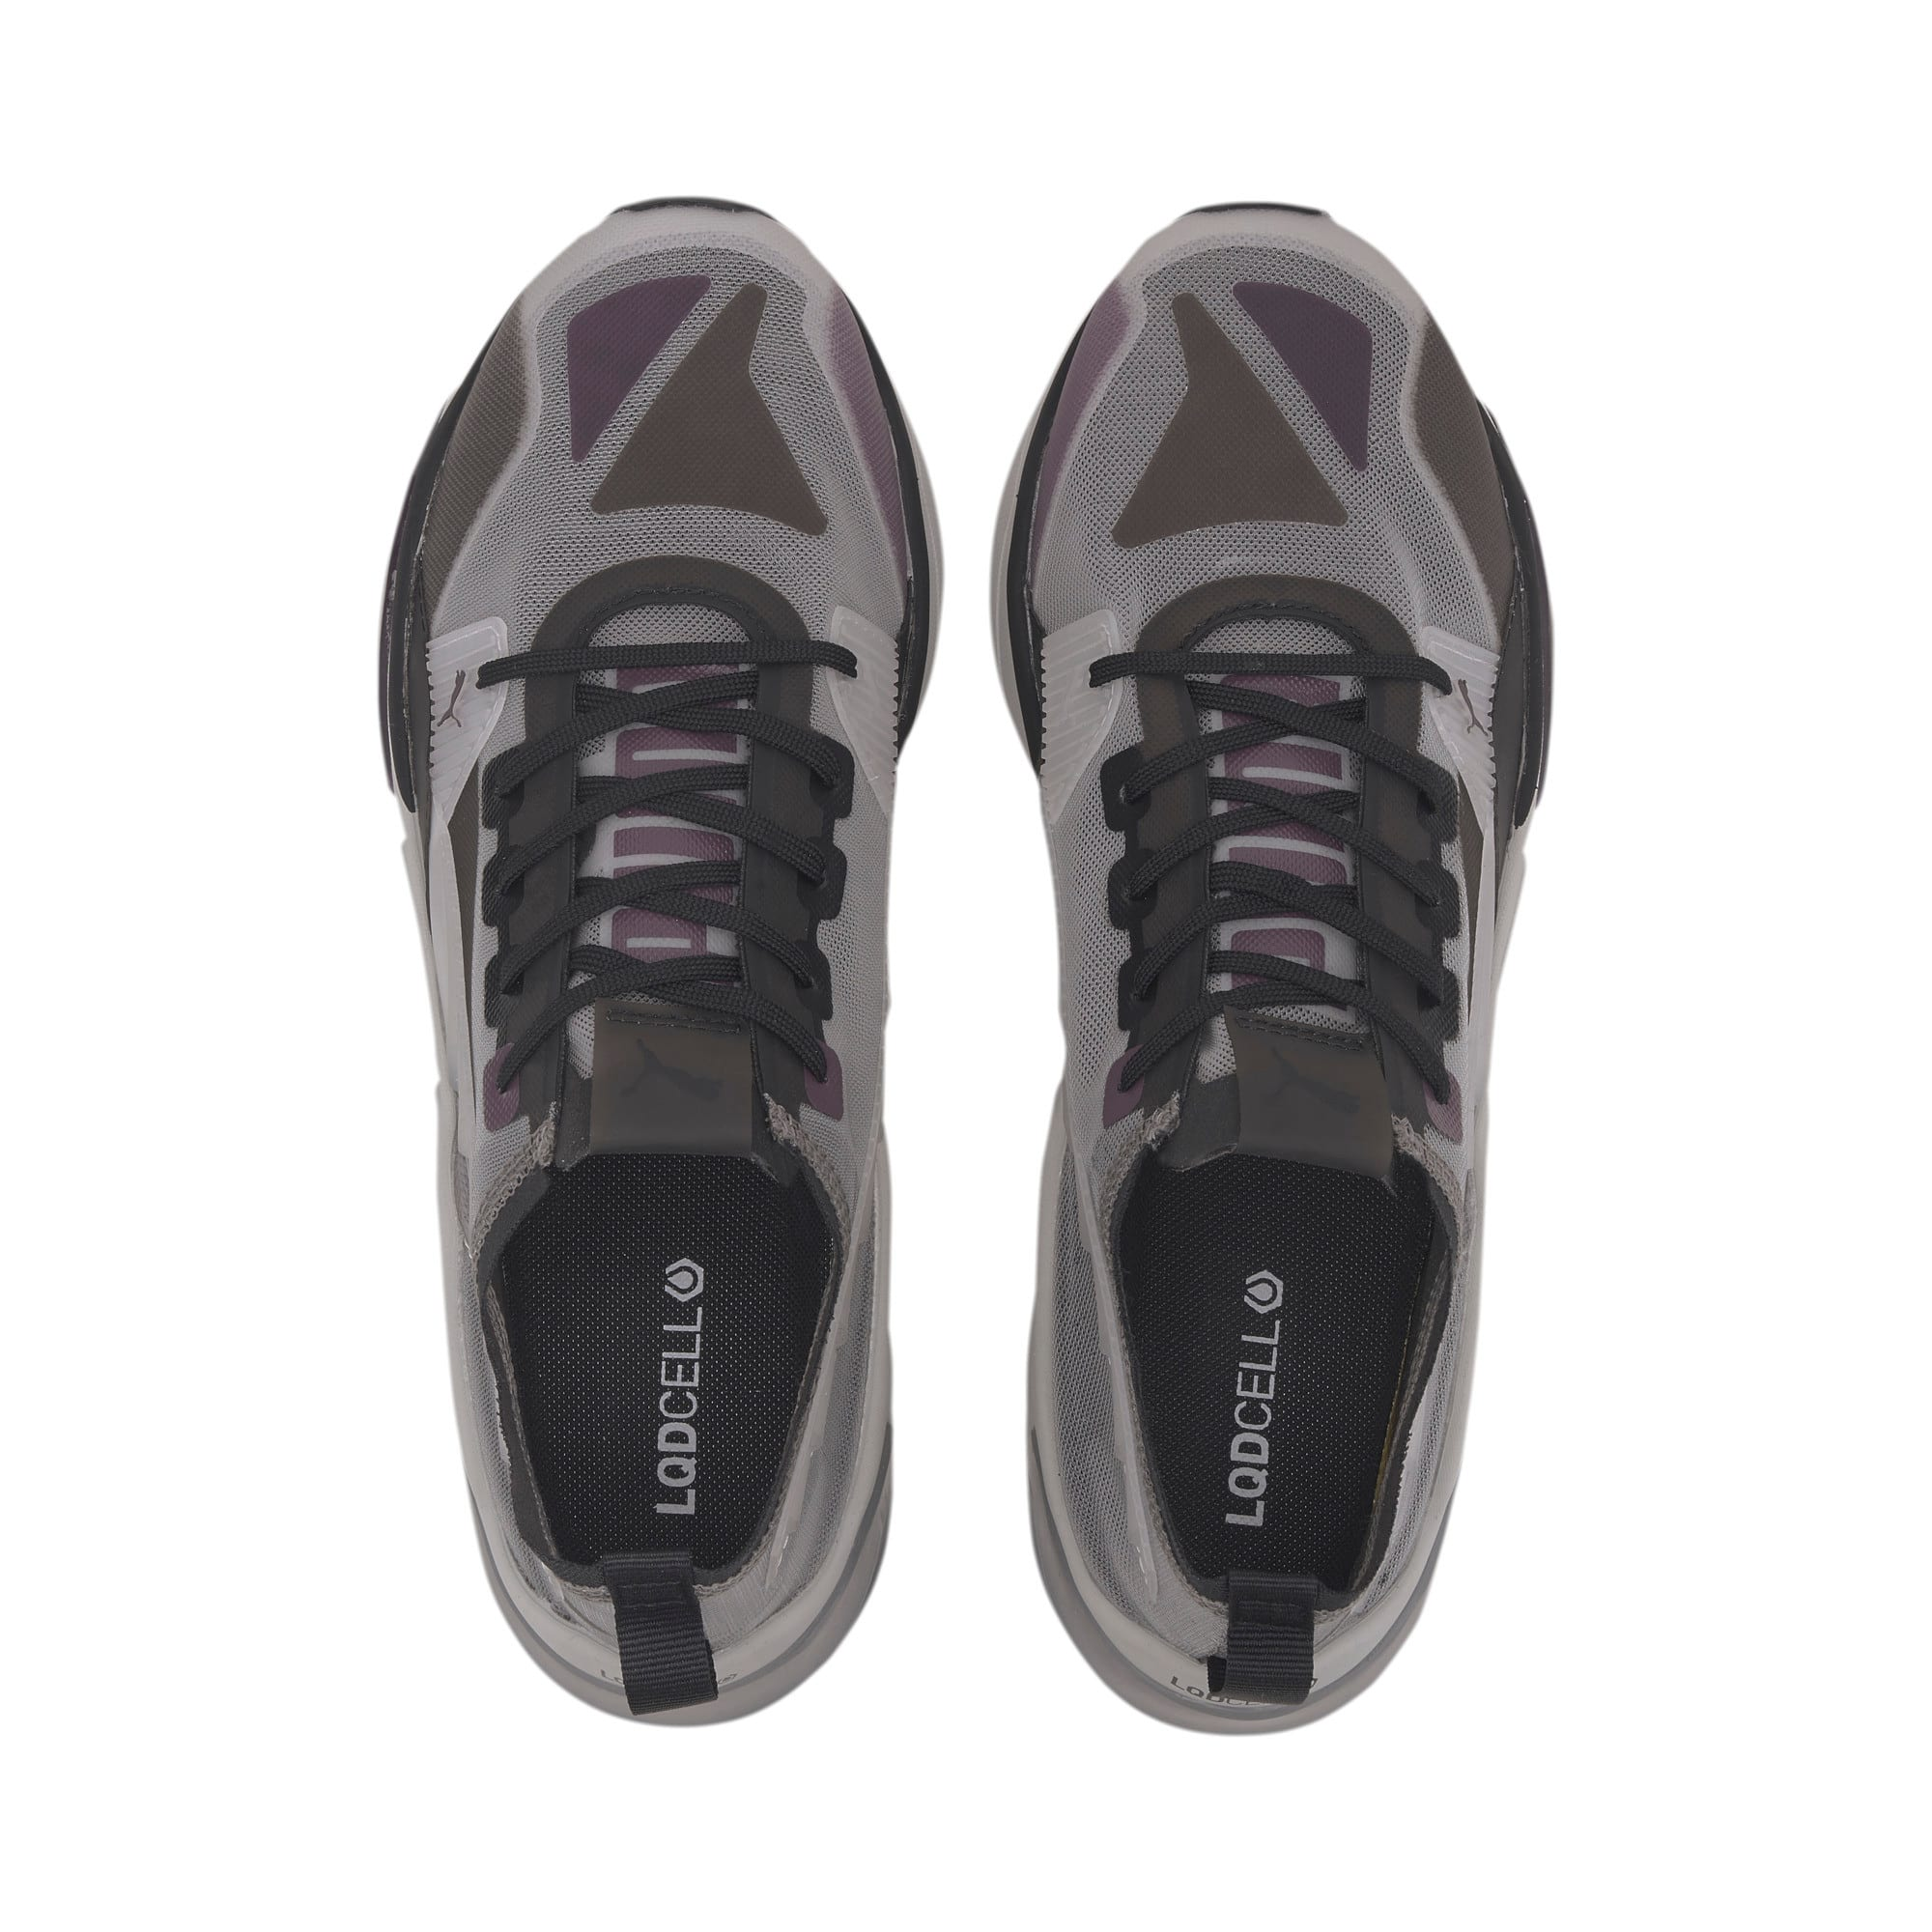 Thumbnail 6 of LQDCELL Optic Sheer Men's Training Shoes, Gray Violet-Puma Black, medium